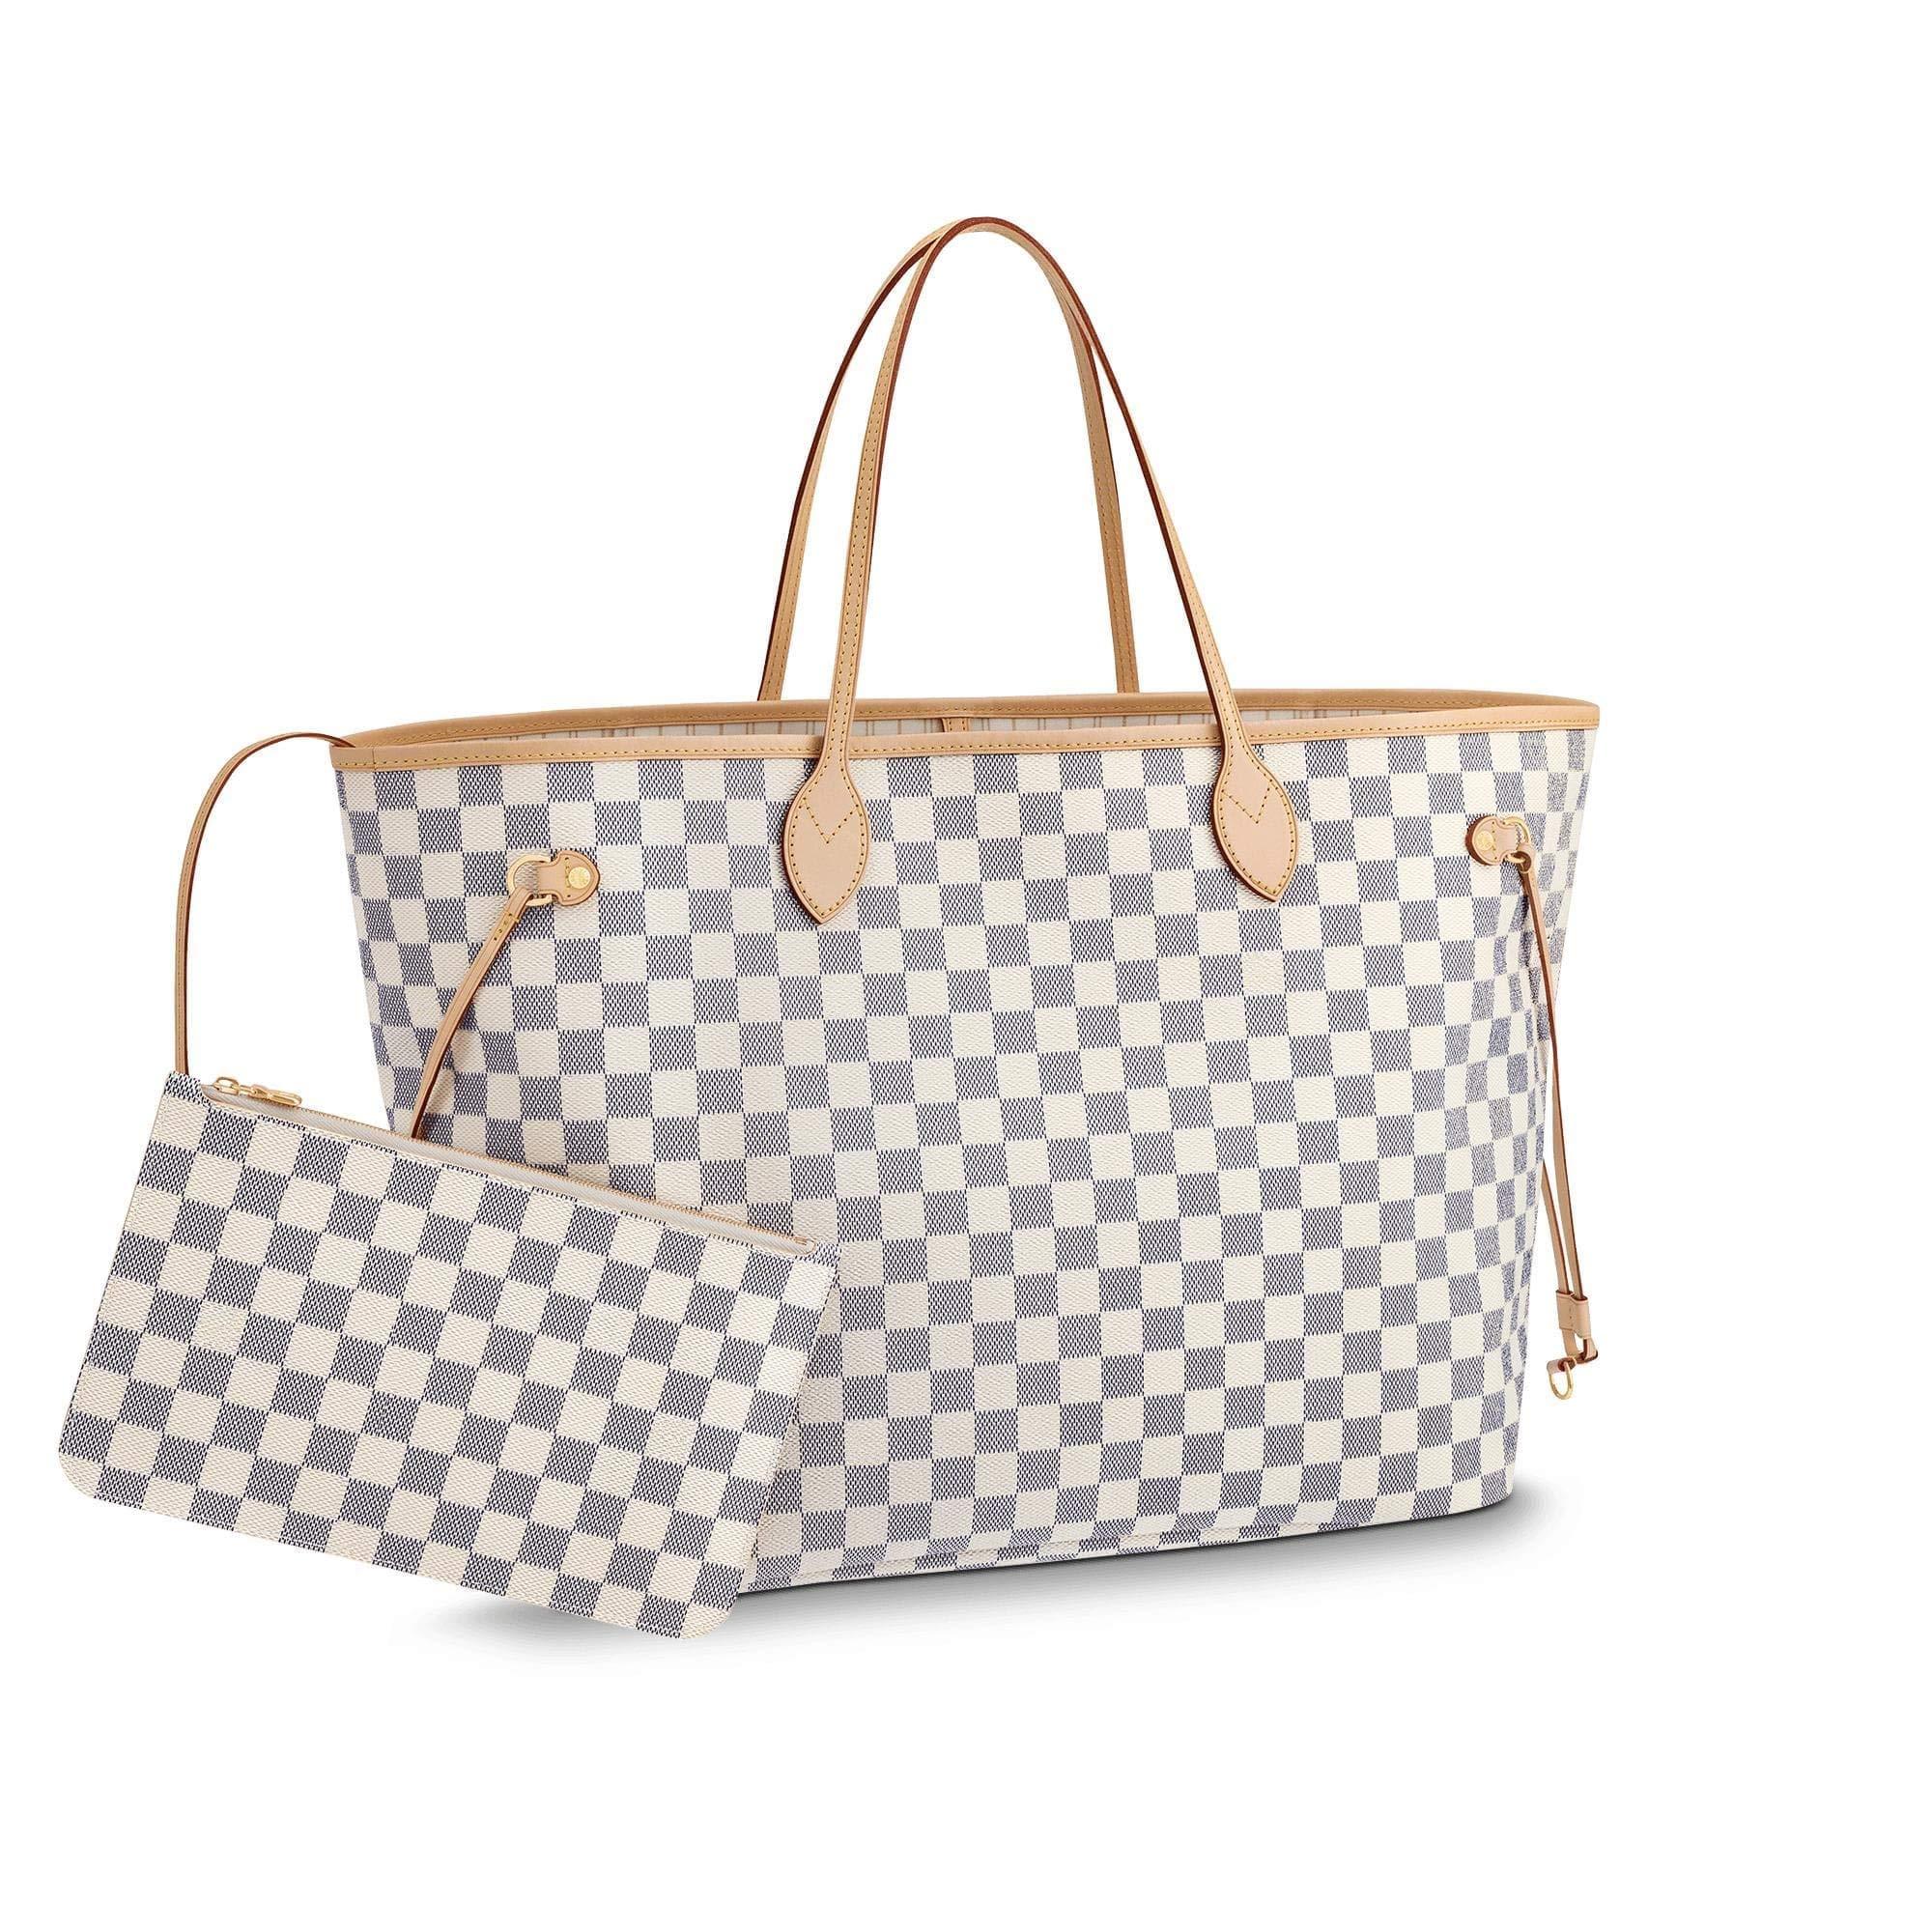 Neverfull Style Canvas Woman Organizer Handbag Azur Tote Shoulder Fashion  Bag GM Size by LAMB  0768444499612  Amazon.com  Books 2c8c4e6fa87cf